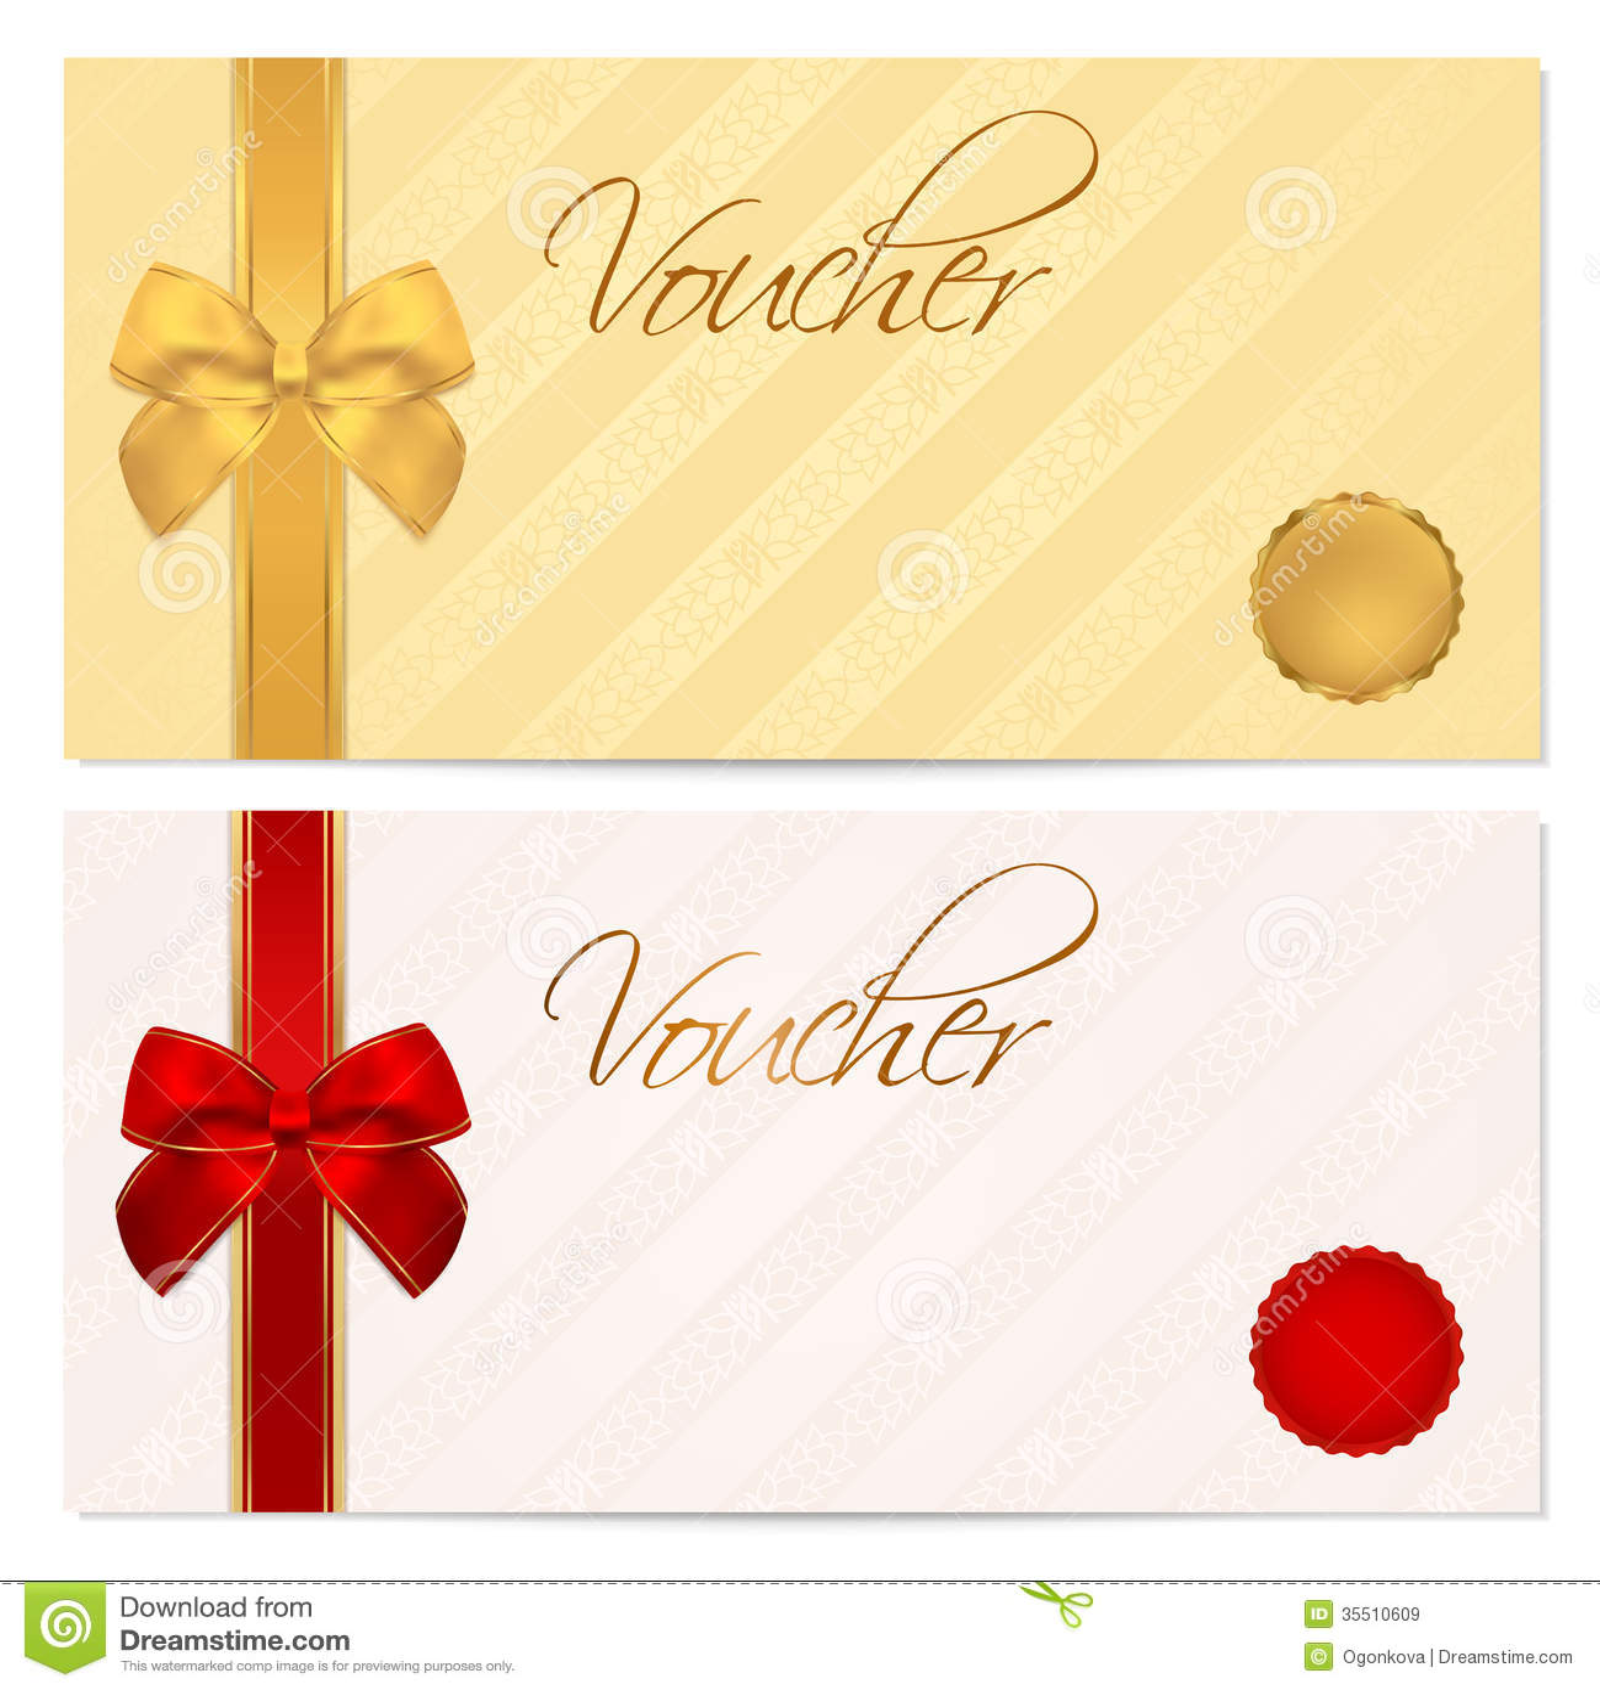 design a voucher template wordpress theme and templates christmas t voucher template images about